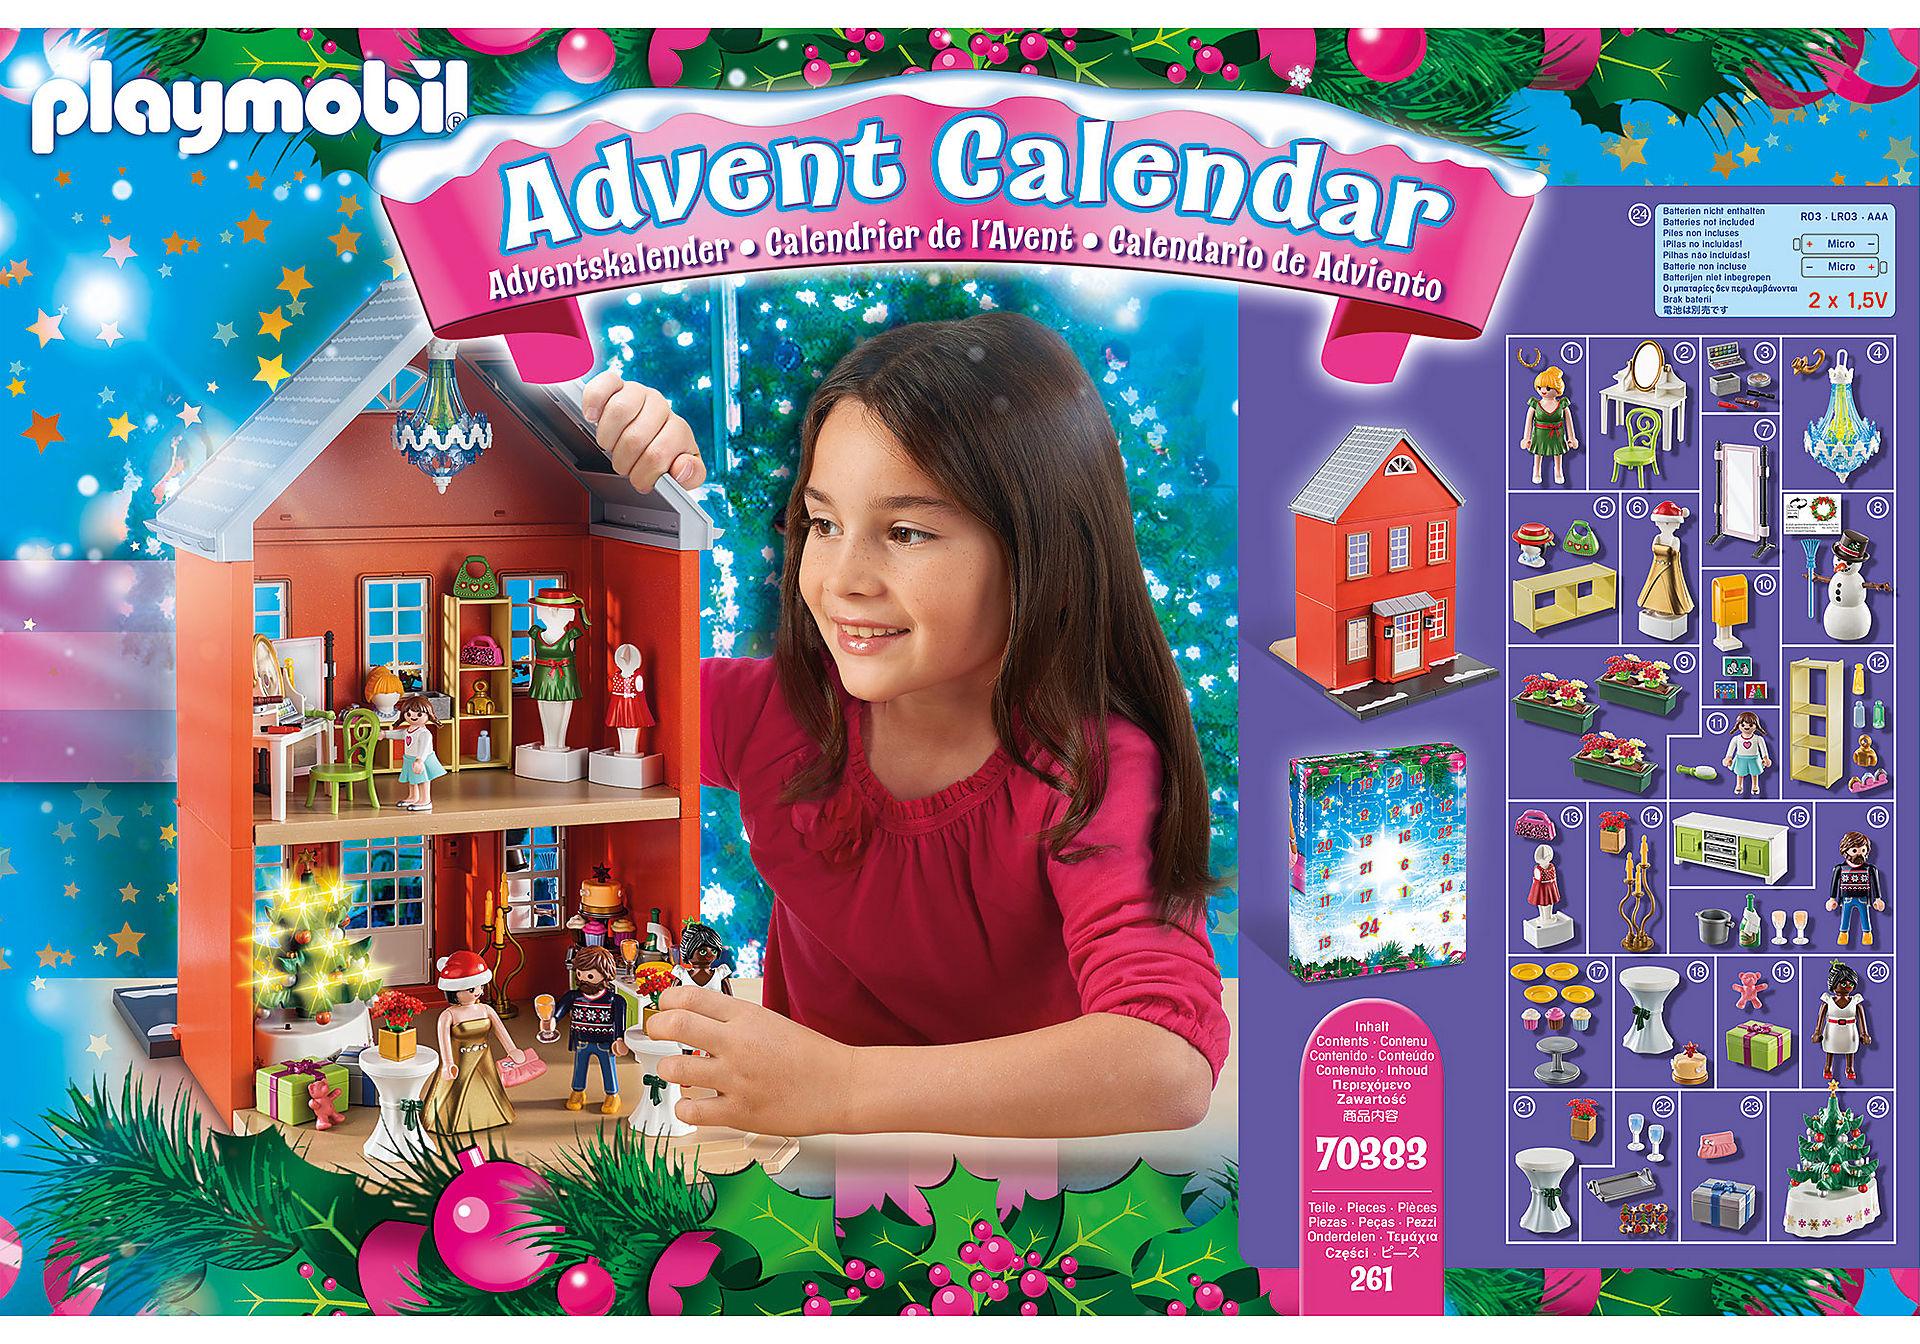 http://media.playmobil.com/i/playmobil/70383_product_extra1/Adventskalender XL Kerst in huis